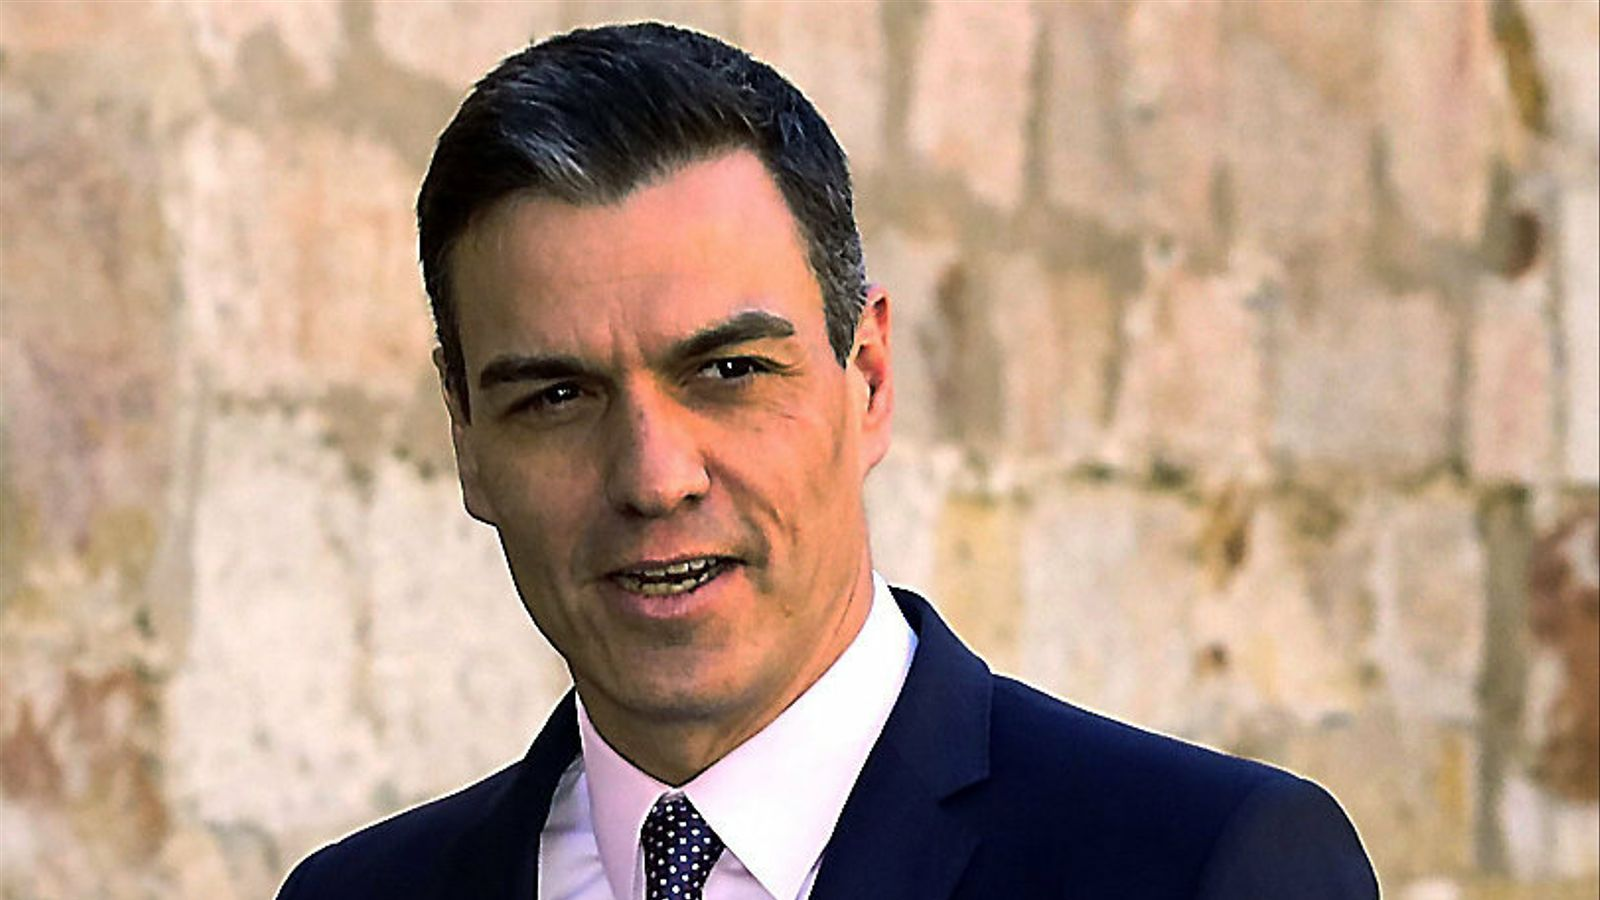 El president del govern espanyol en funcions i secretari general del PSOE, Pedro Sánchez.